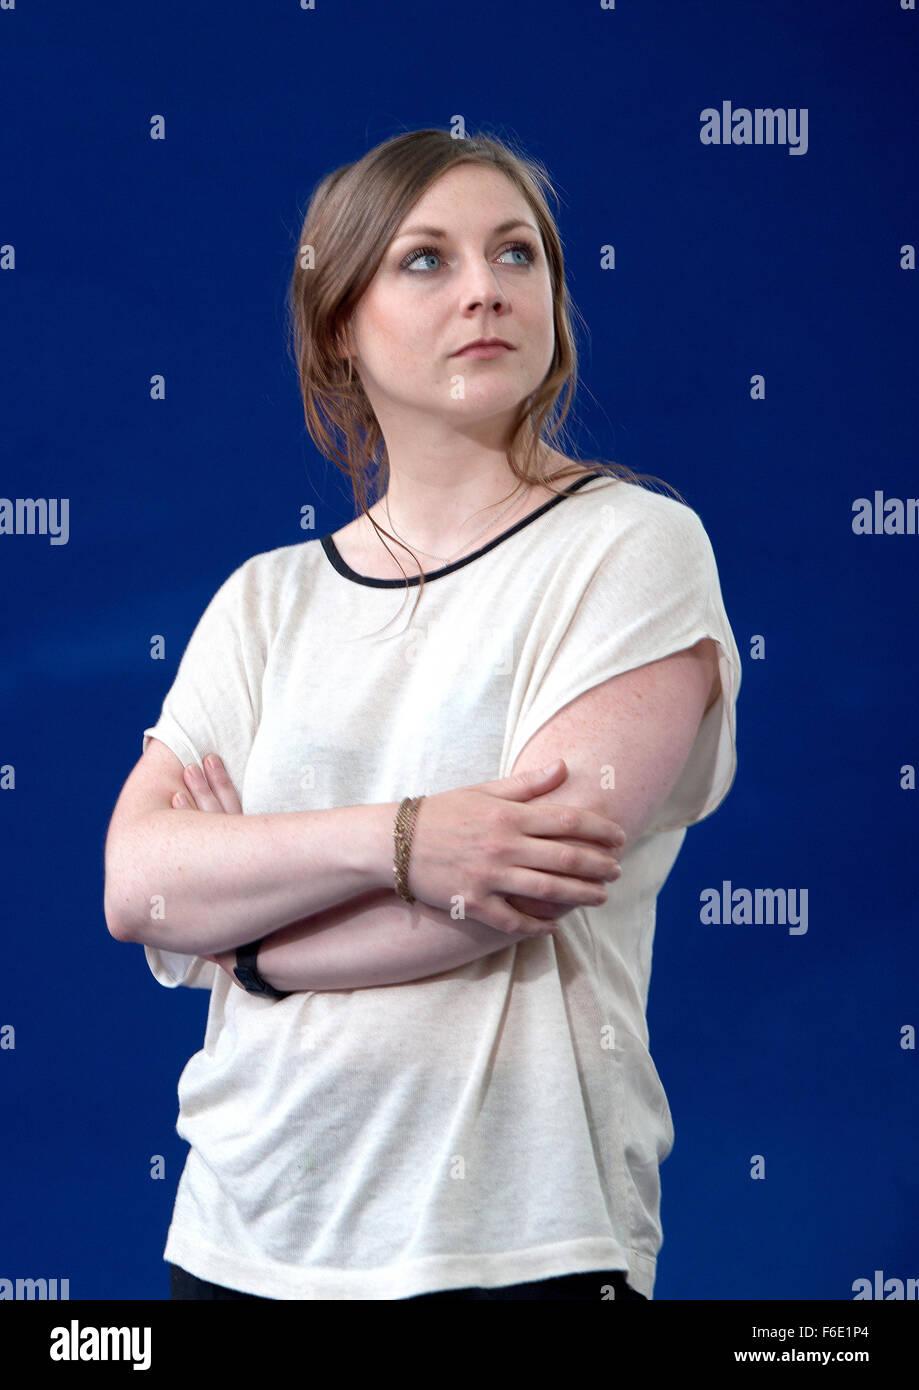 Edinburgh International Book Festival 2013 portrait of Amy Sackville at Charlotte Square Garden   Pic by Pako Mera - Stock Image